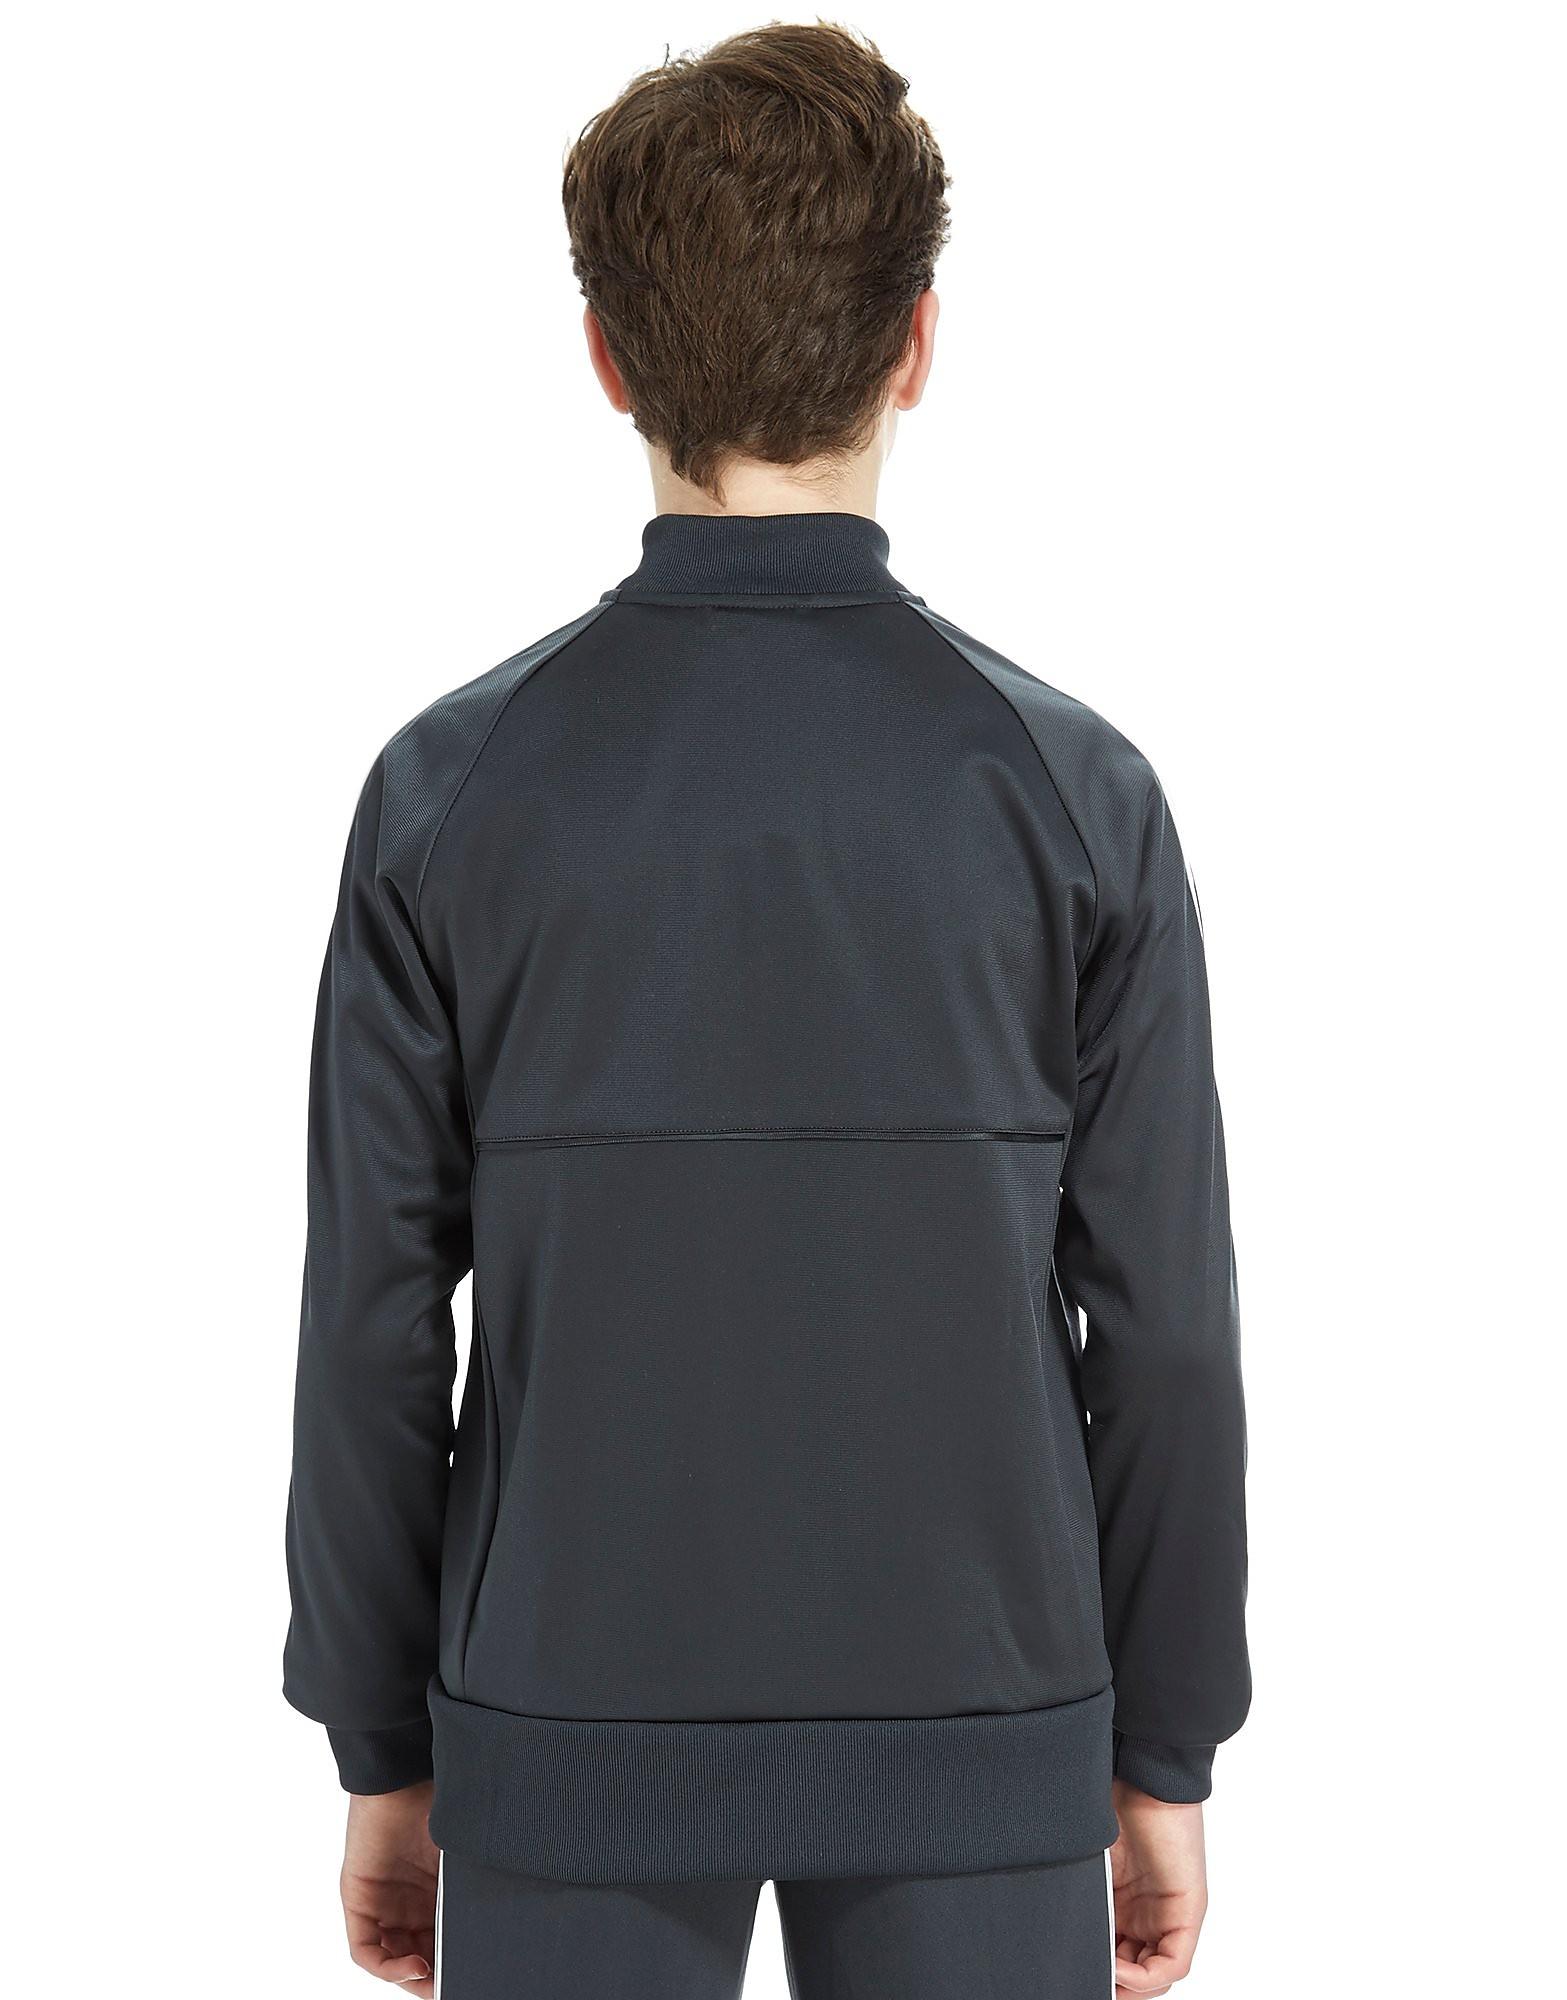 adidas Tango 1/2 Zip Jacket Junior